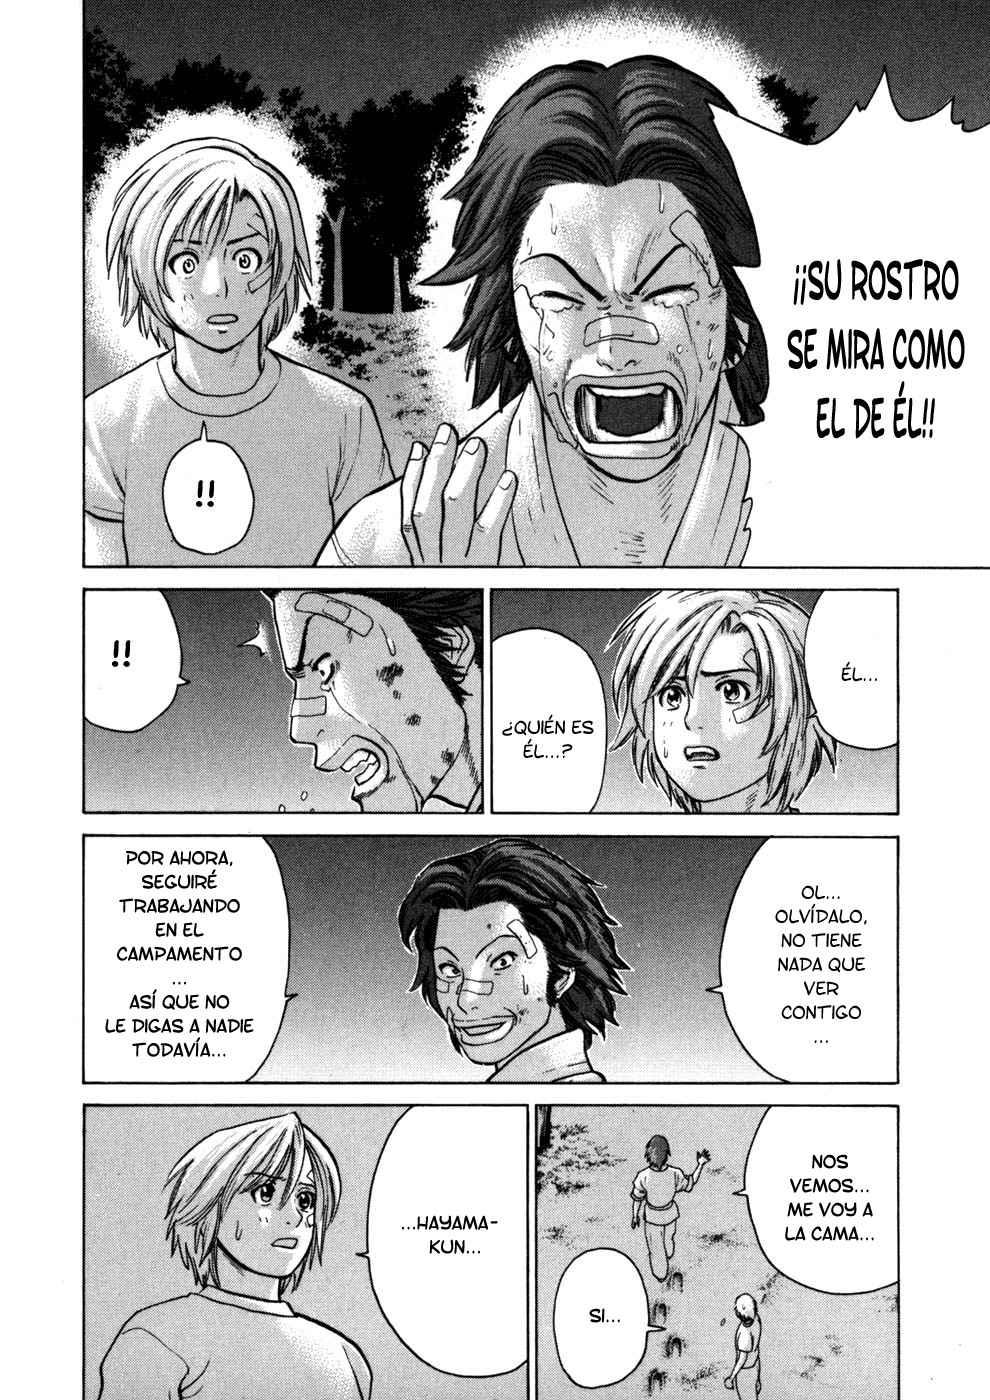 http://c5.ninemanga.com/es_manga/53/501/454740/52ccca5b94cc1bda7b3372f62a835678.jpg Page 10